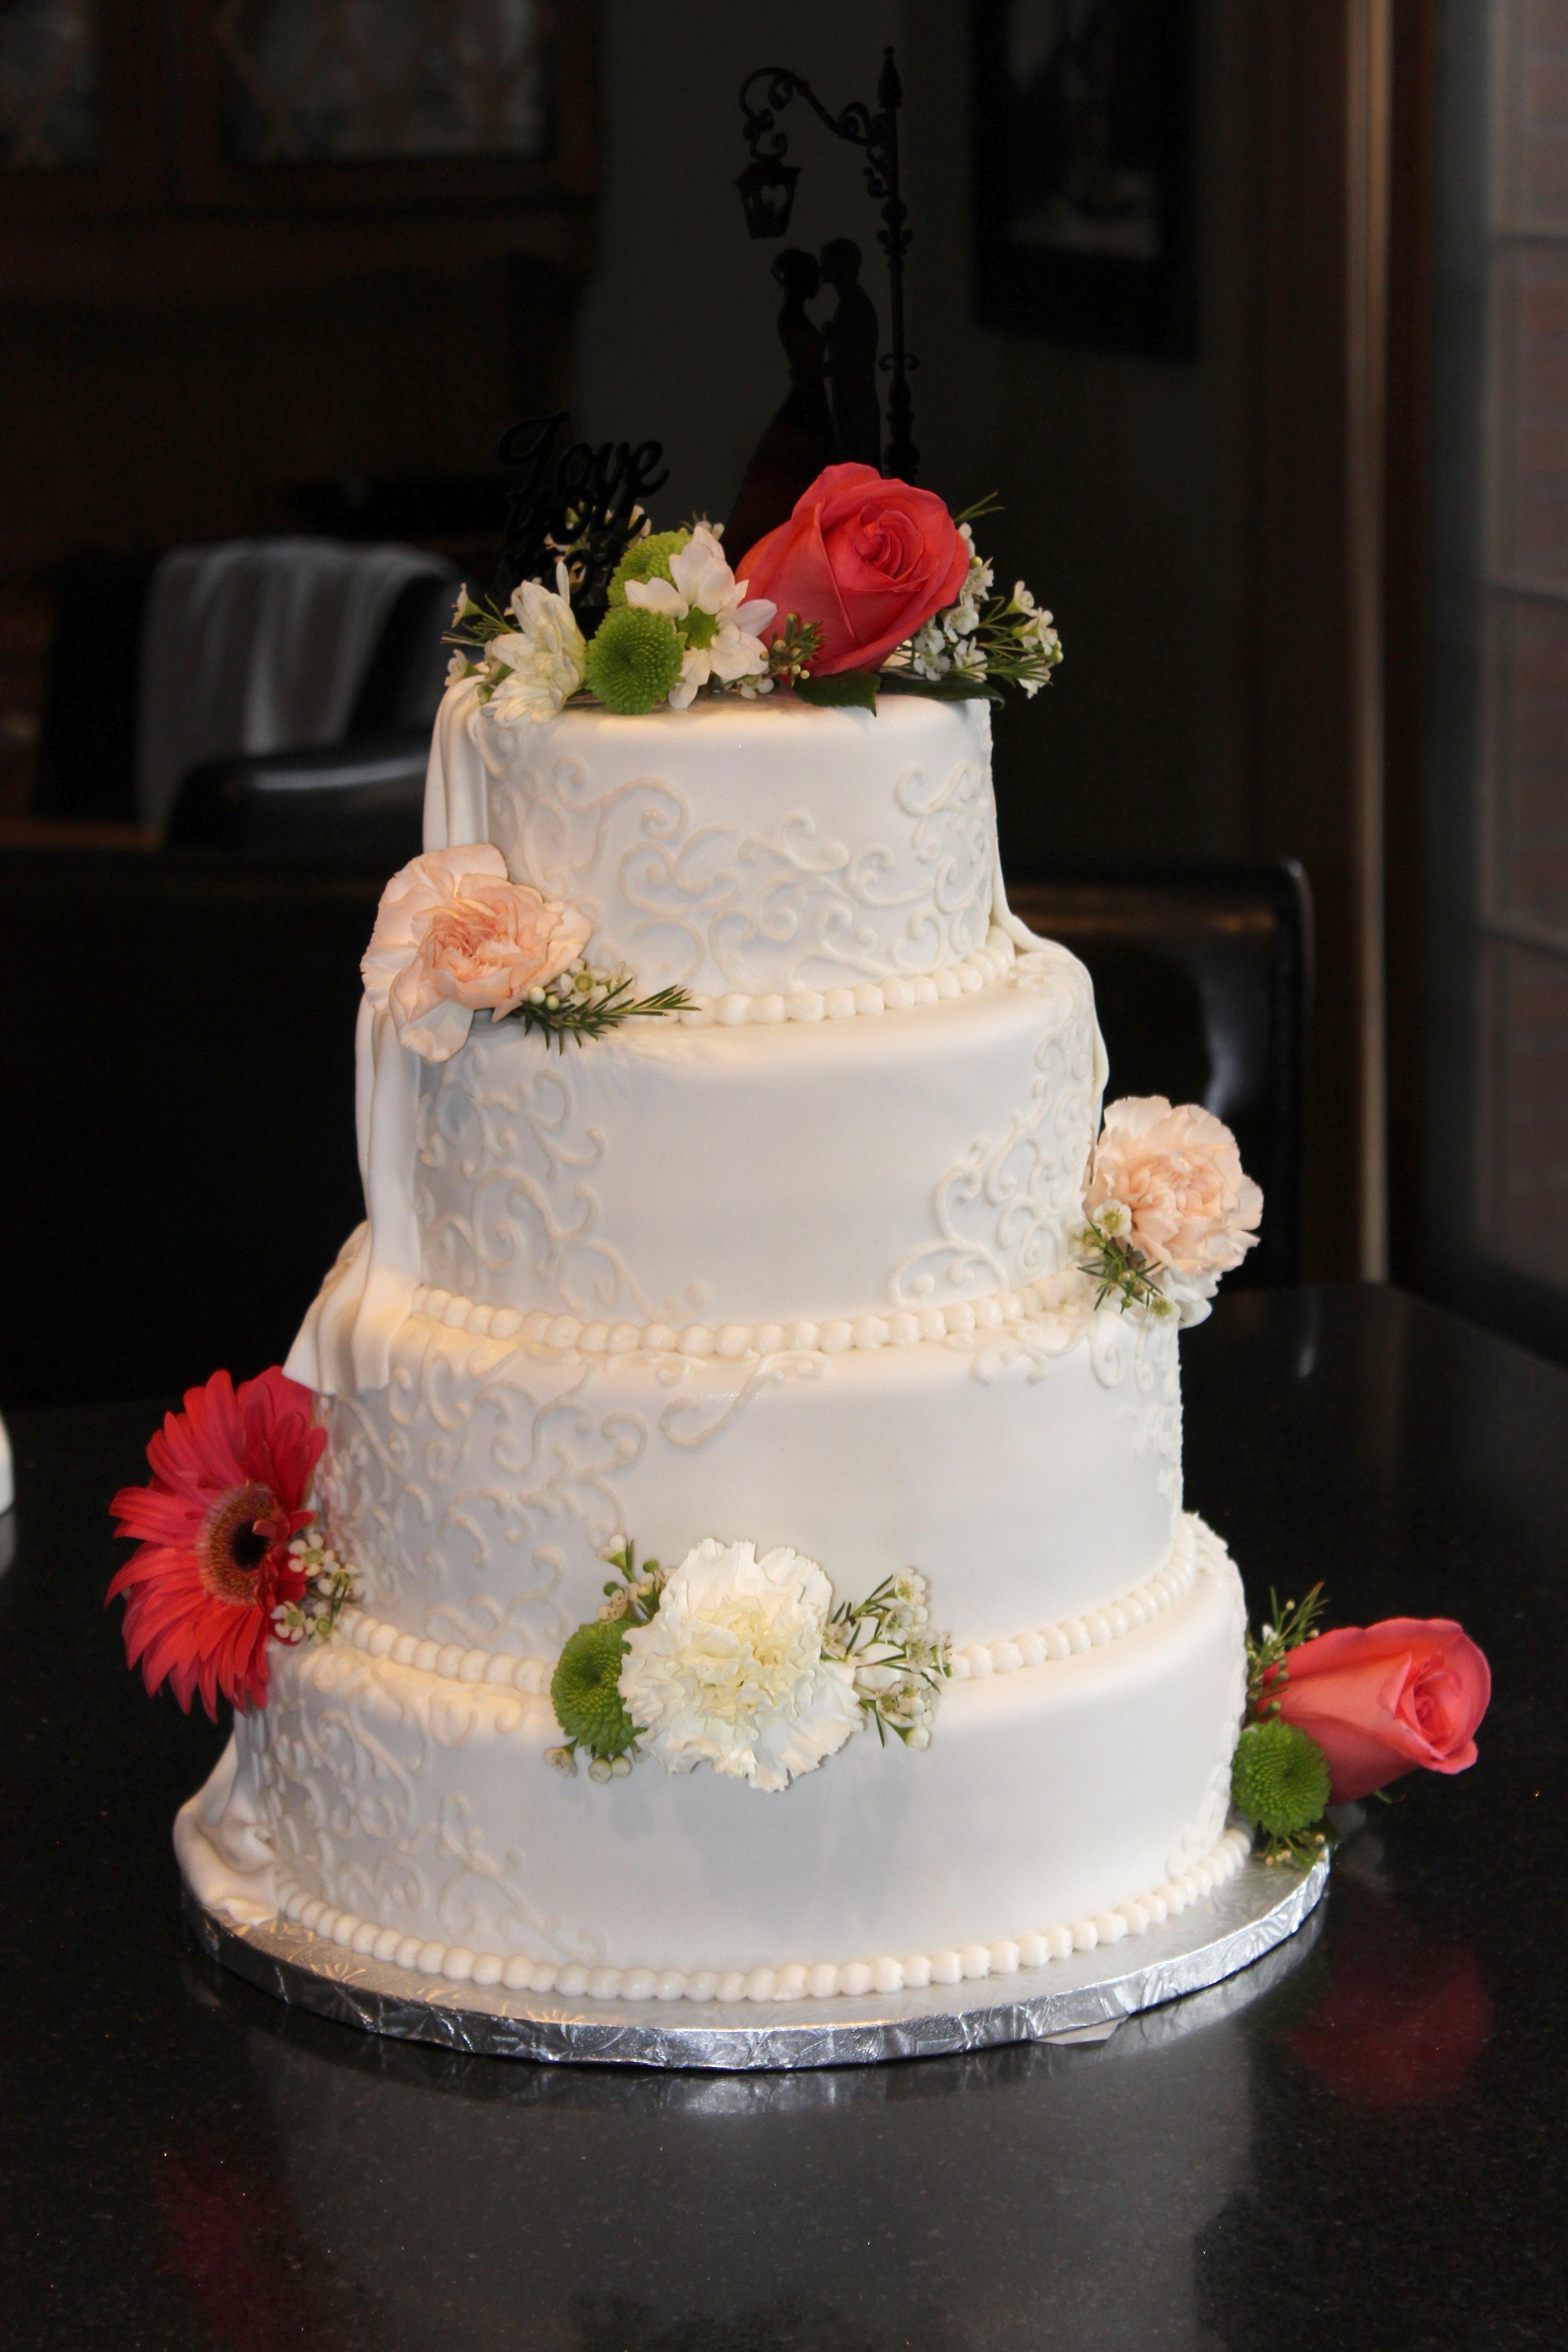 4 Tiered Wedding Cake With Groom's Cake